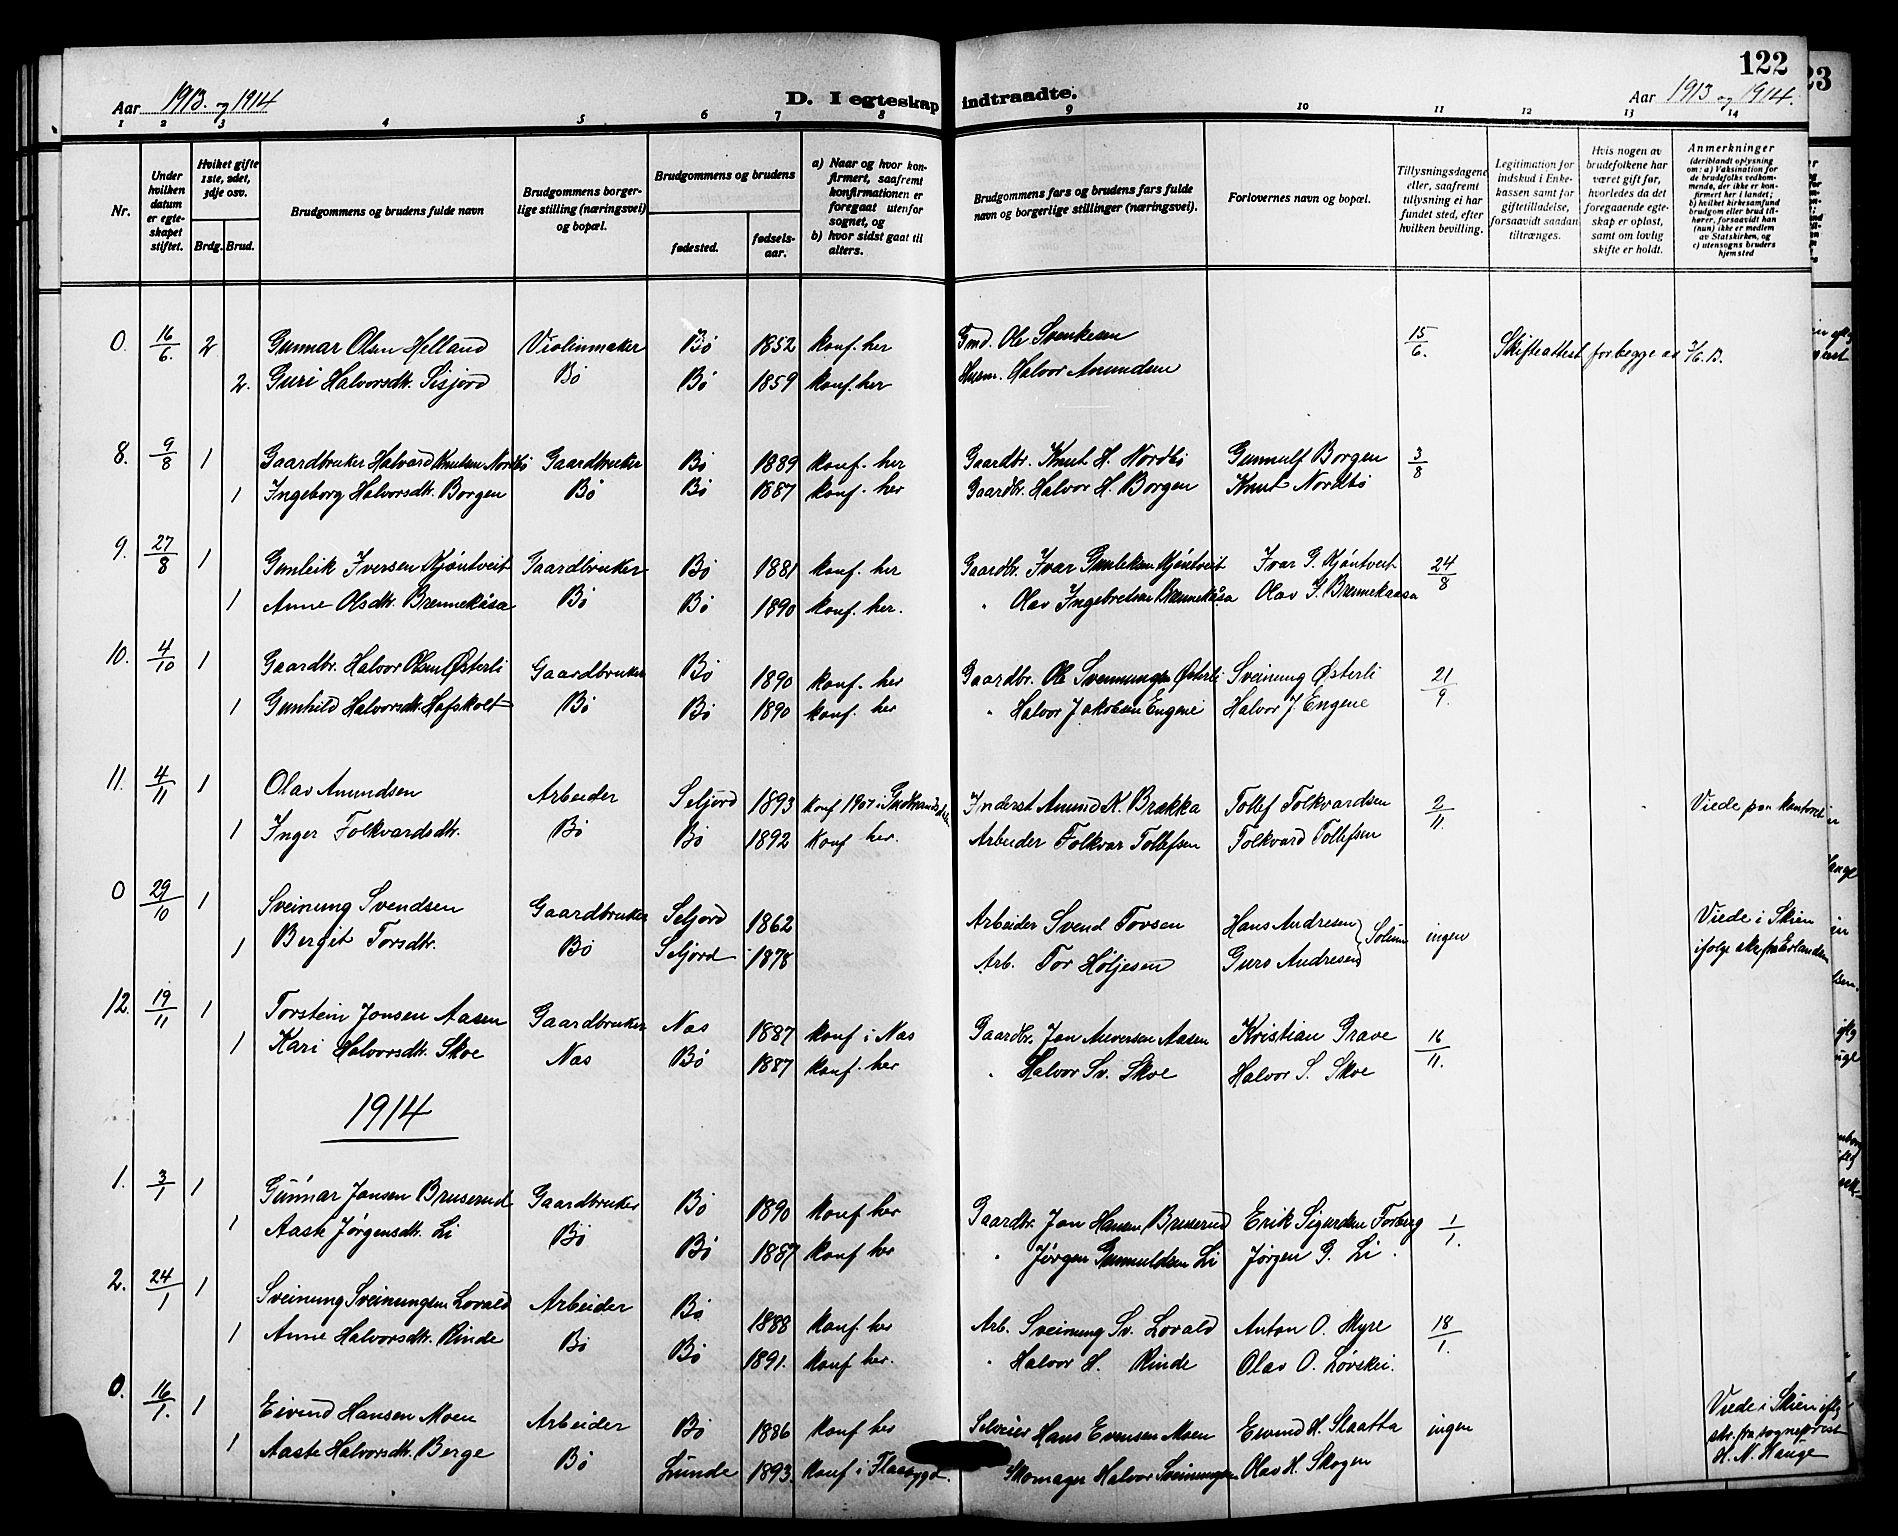 SAKO, Bø kirkebøker, G/Ga/L0007: Klokkerbok nr. 7, 1909-1924, s. 122